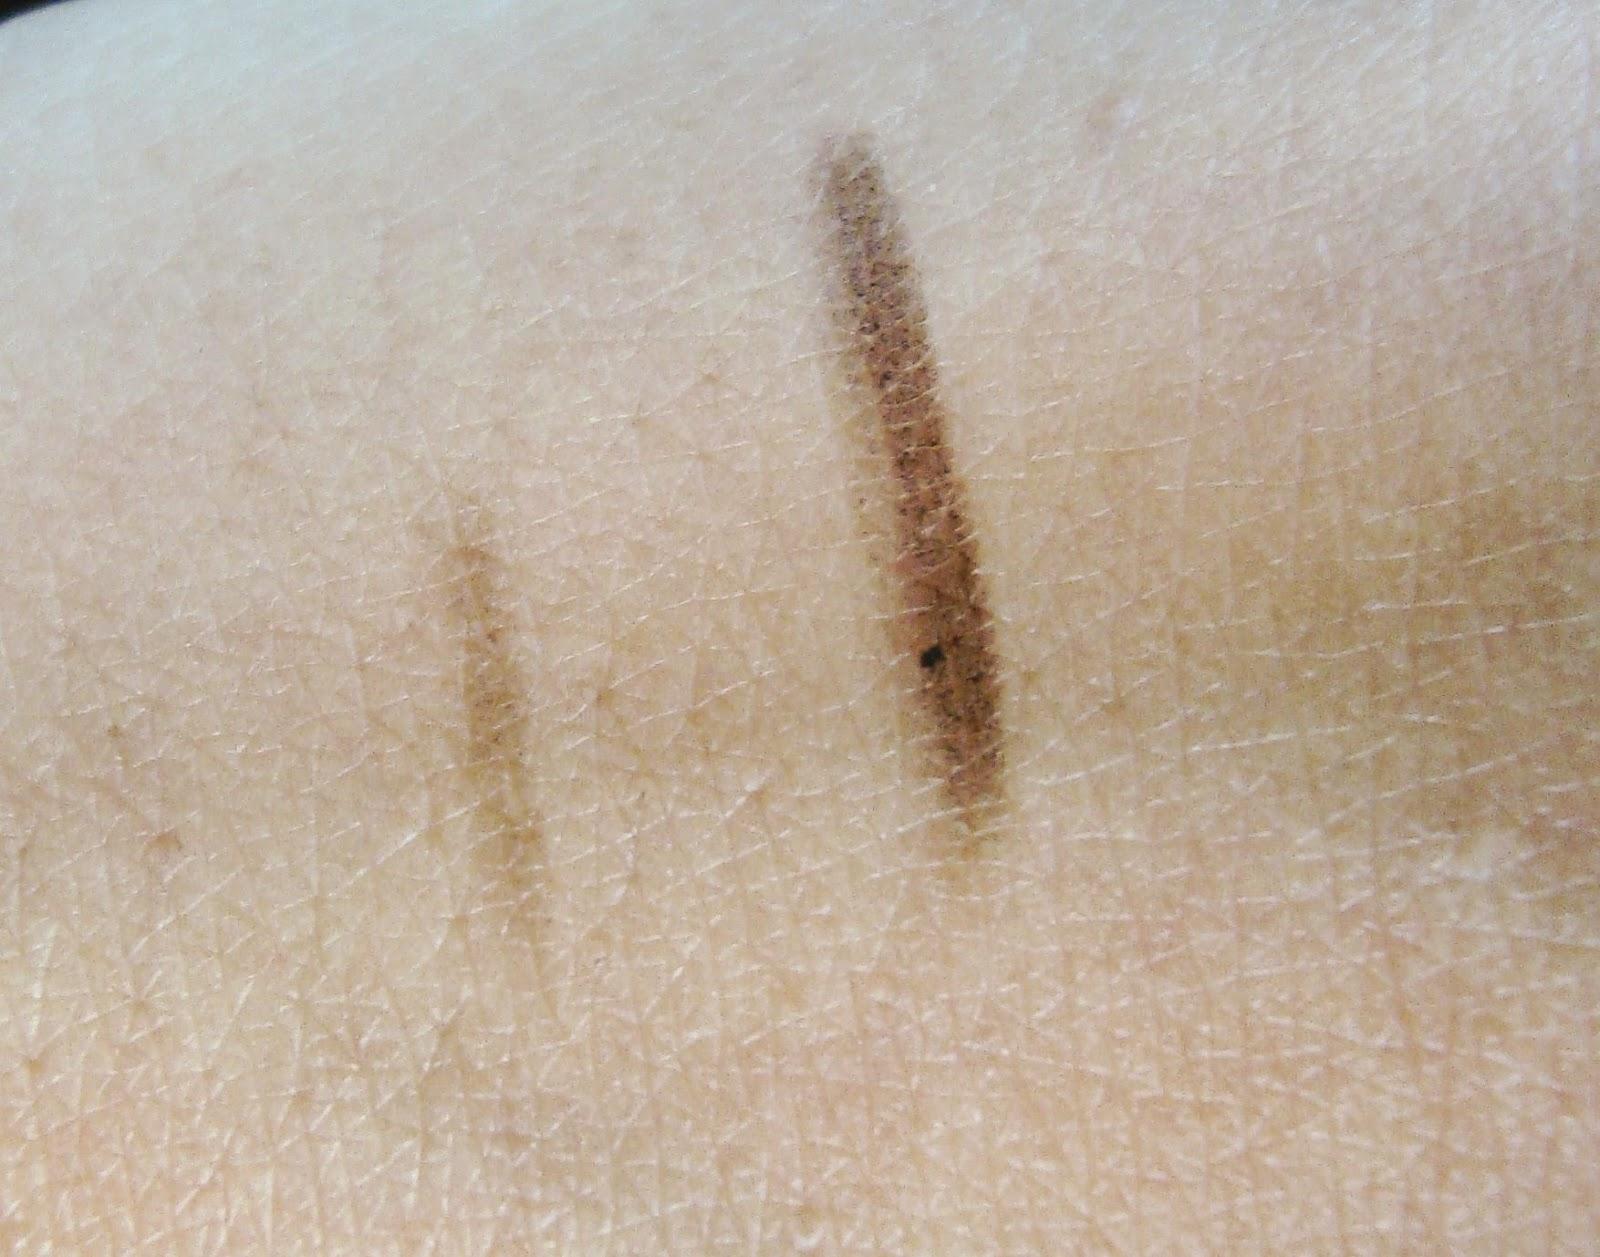 anastasia beverly hills brow wiz in dark brown